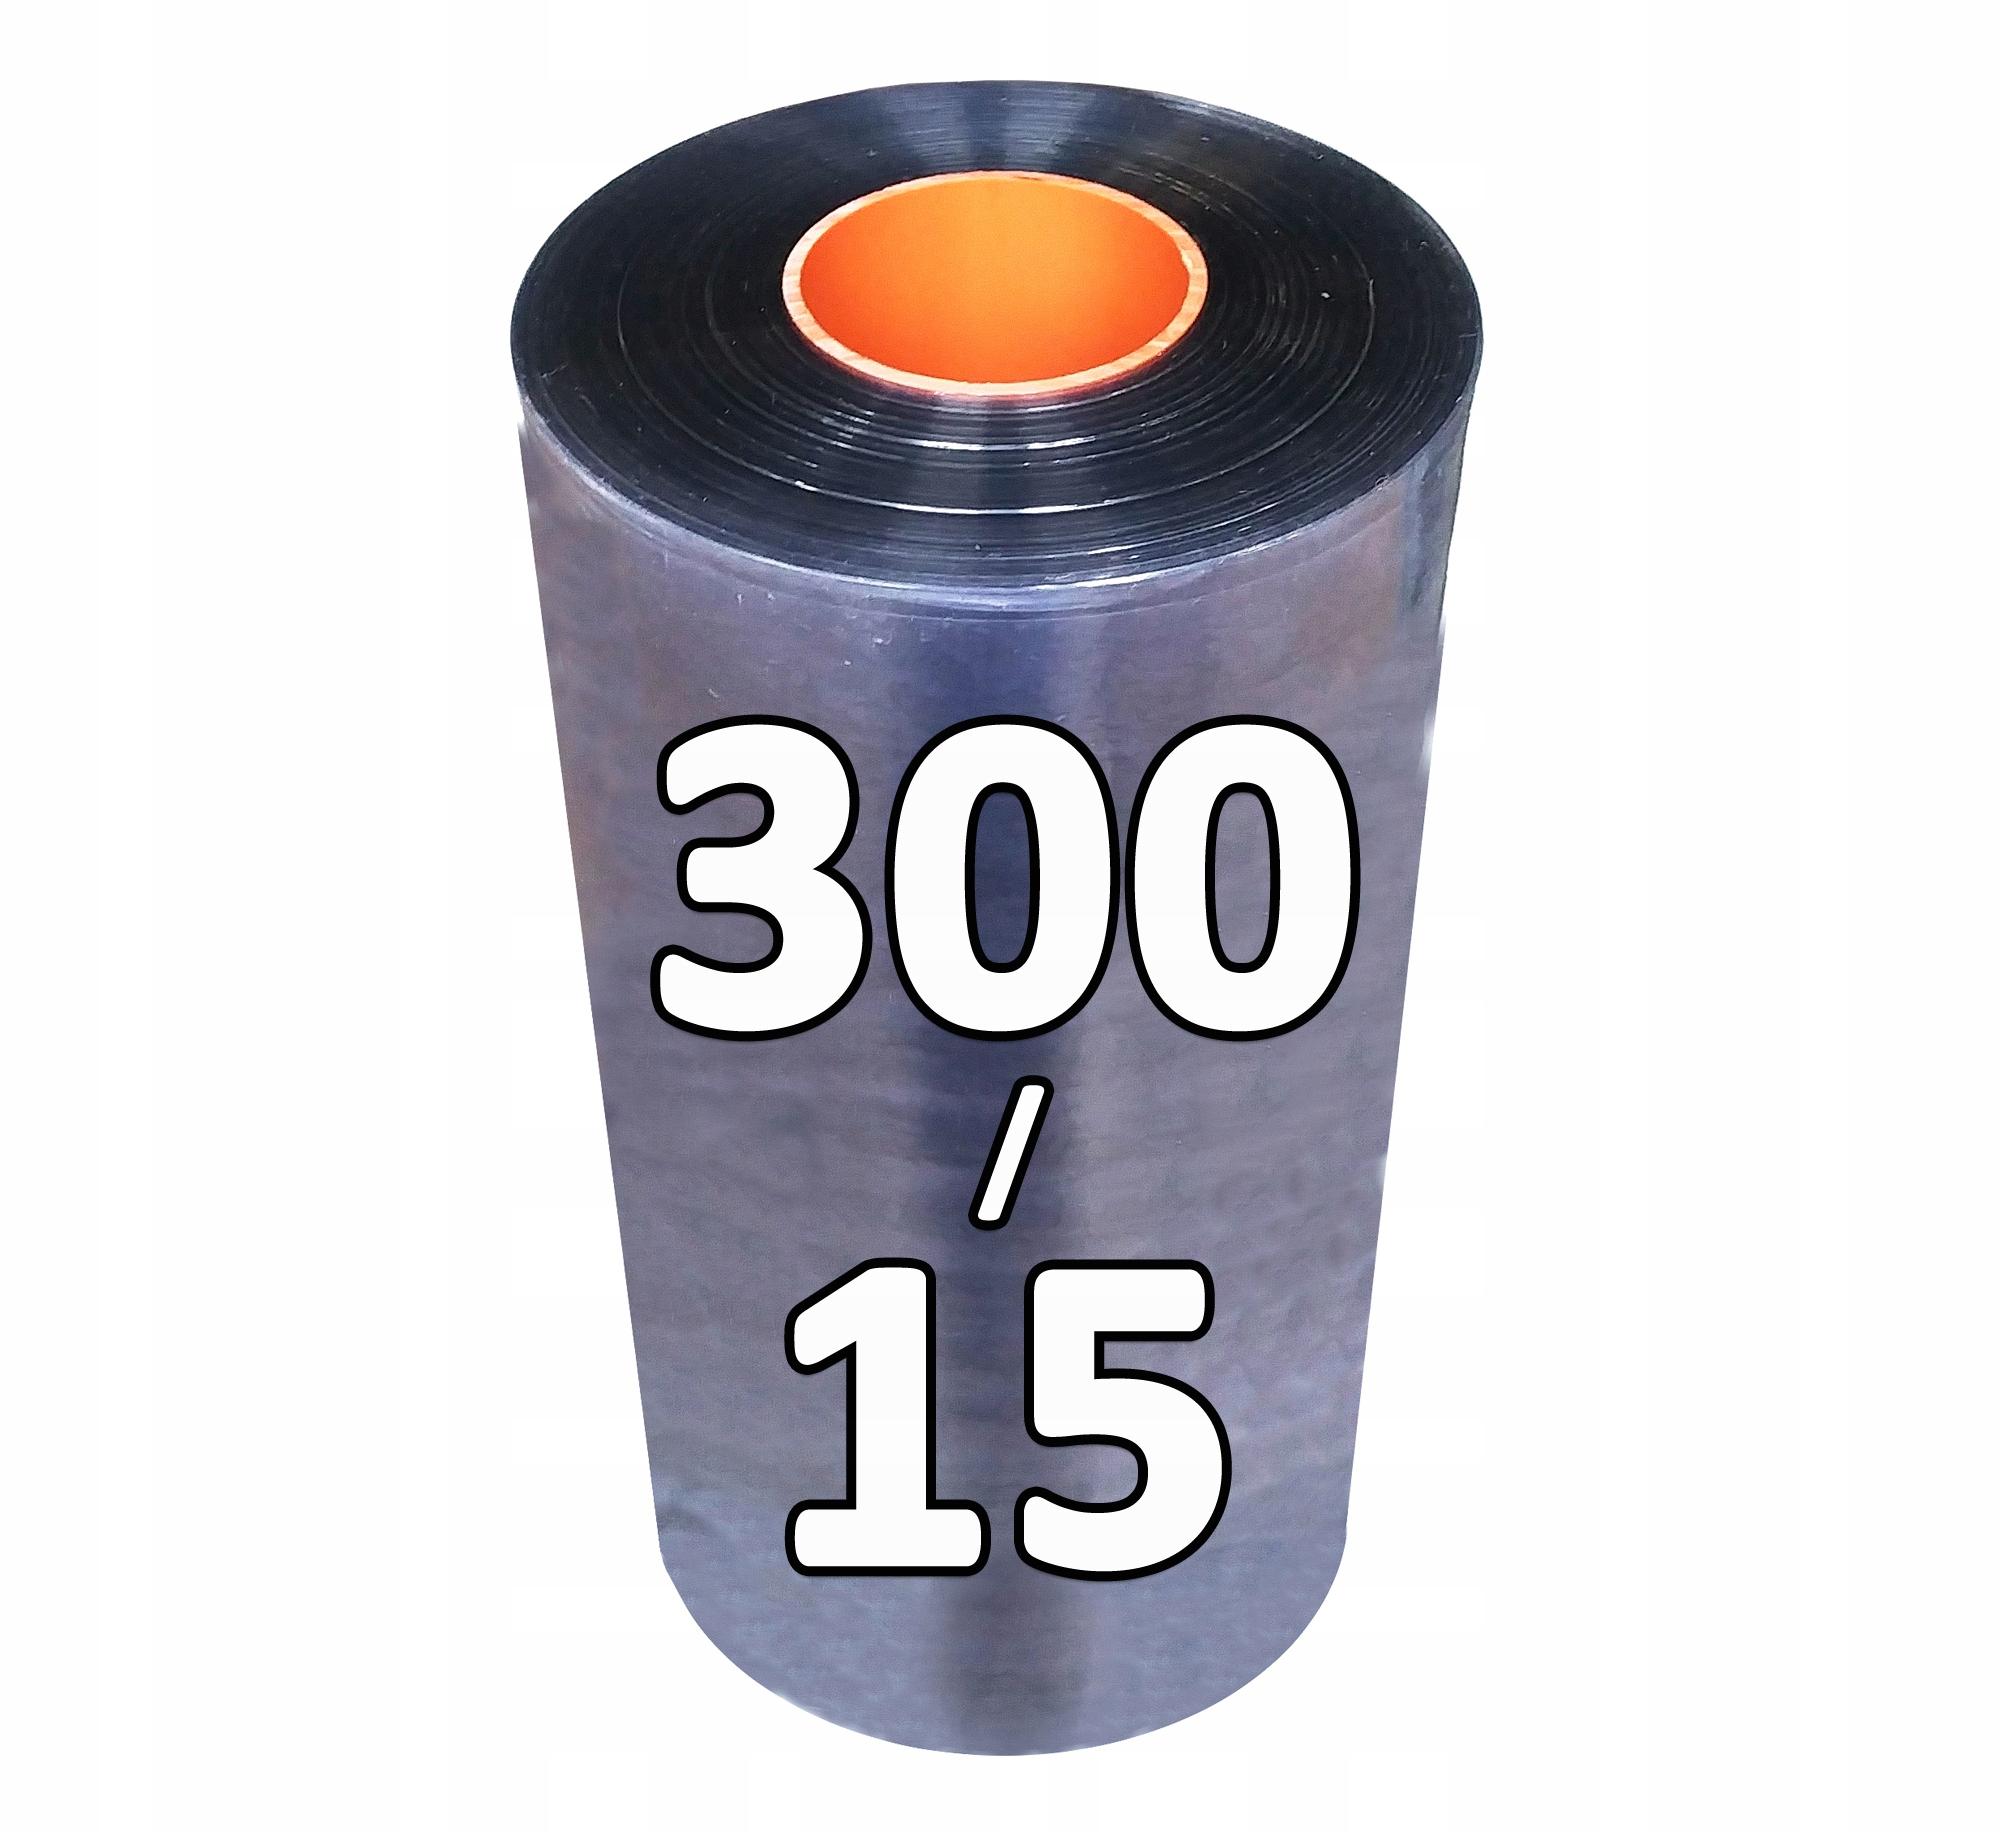 ТЕРМОУСАДОЧНАЯ ПЛЕНКА ПВХ 300/15 - Бельско, Цска!